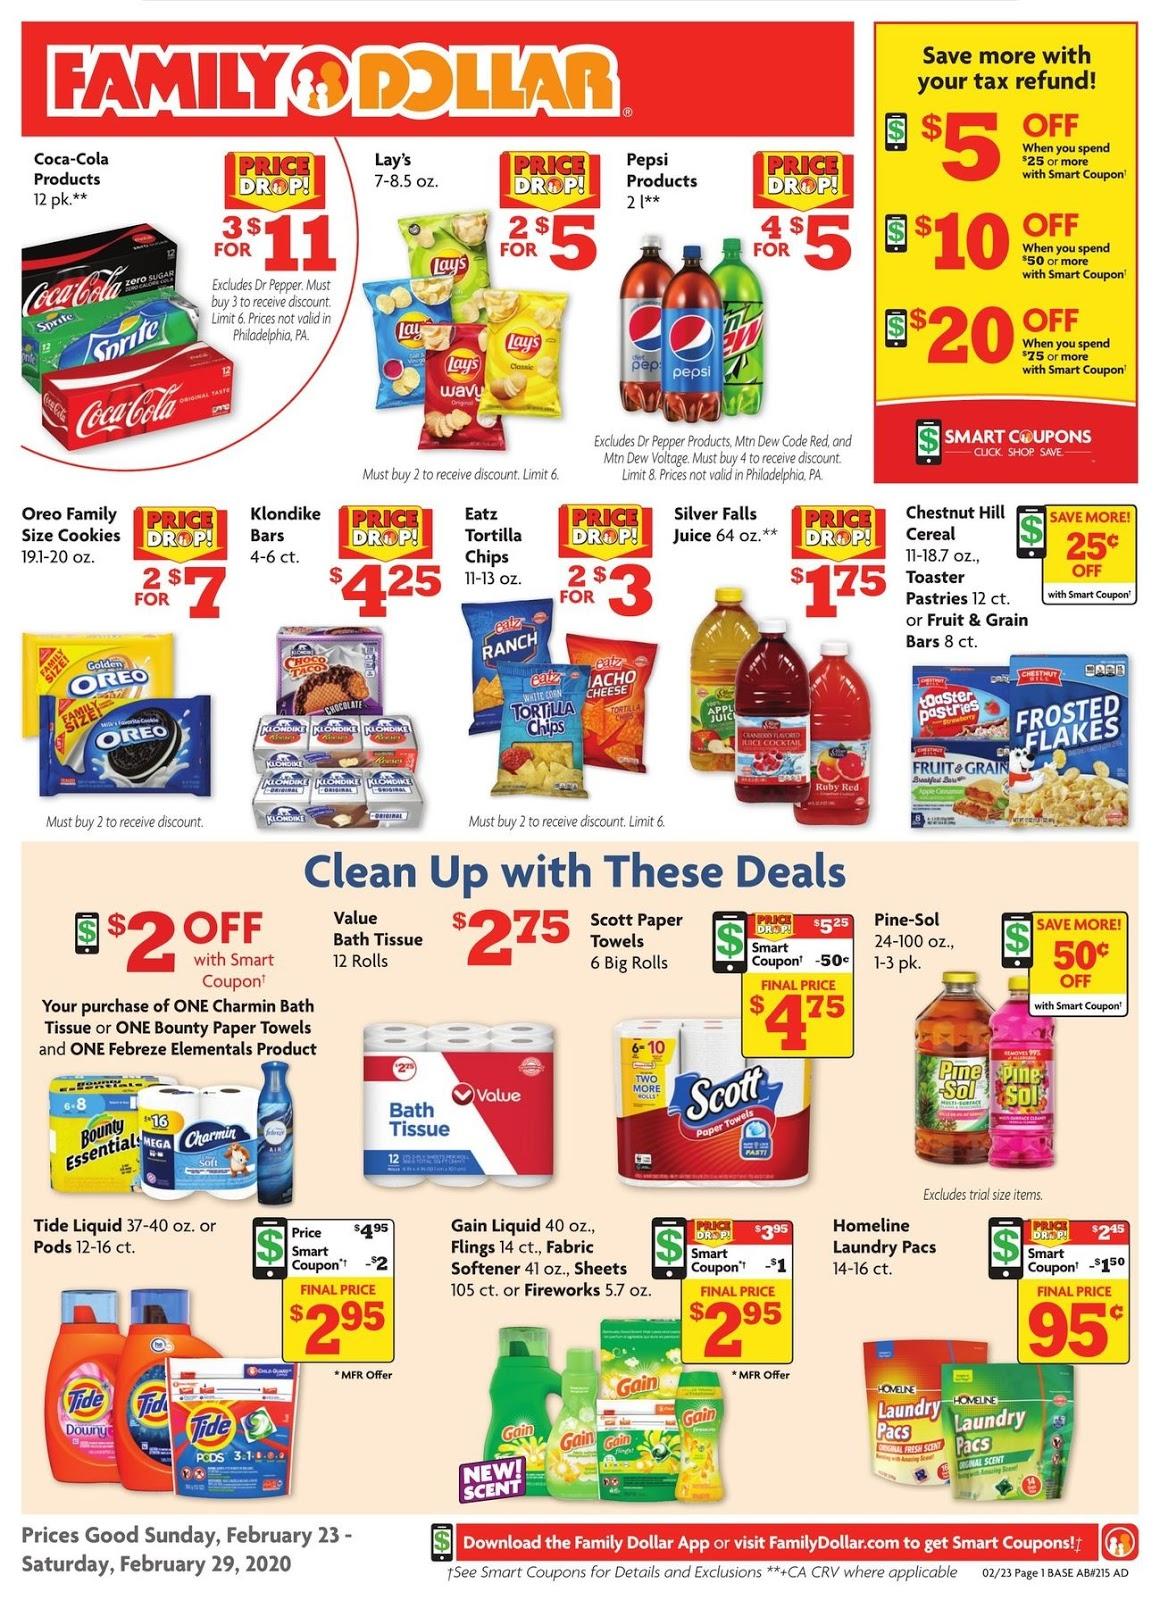 ⭐ Family Dollar Ad 2/23/20 ⭐ Family Dollar Weekly Ad February 23 2020